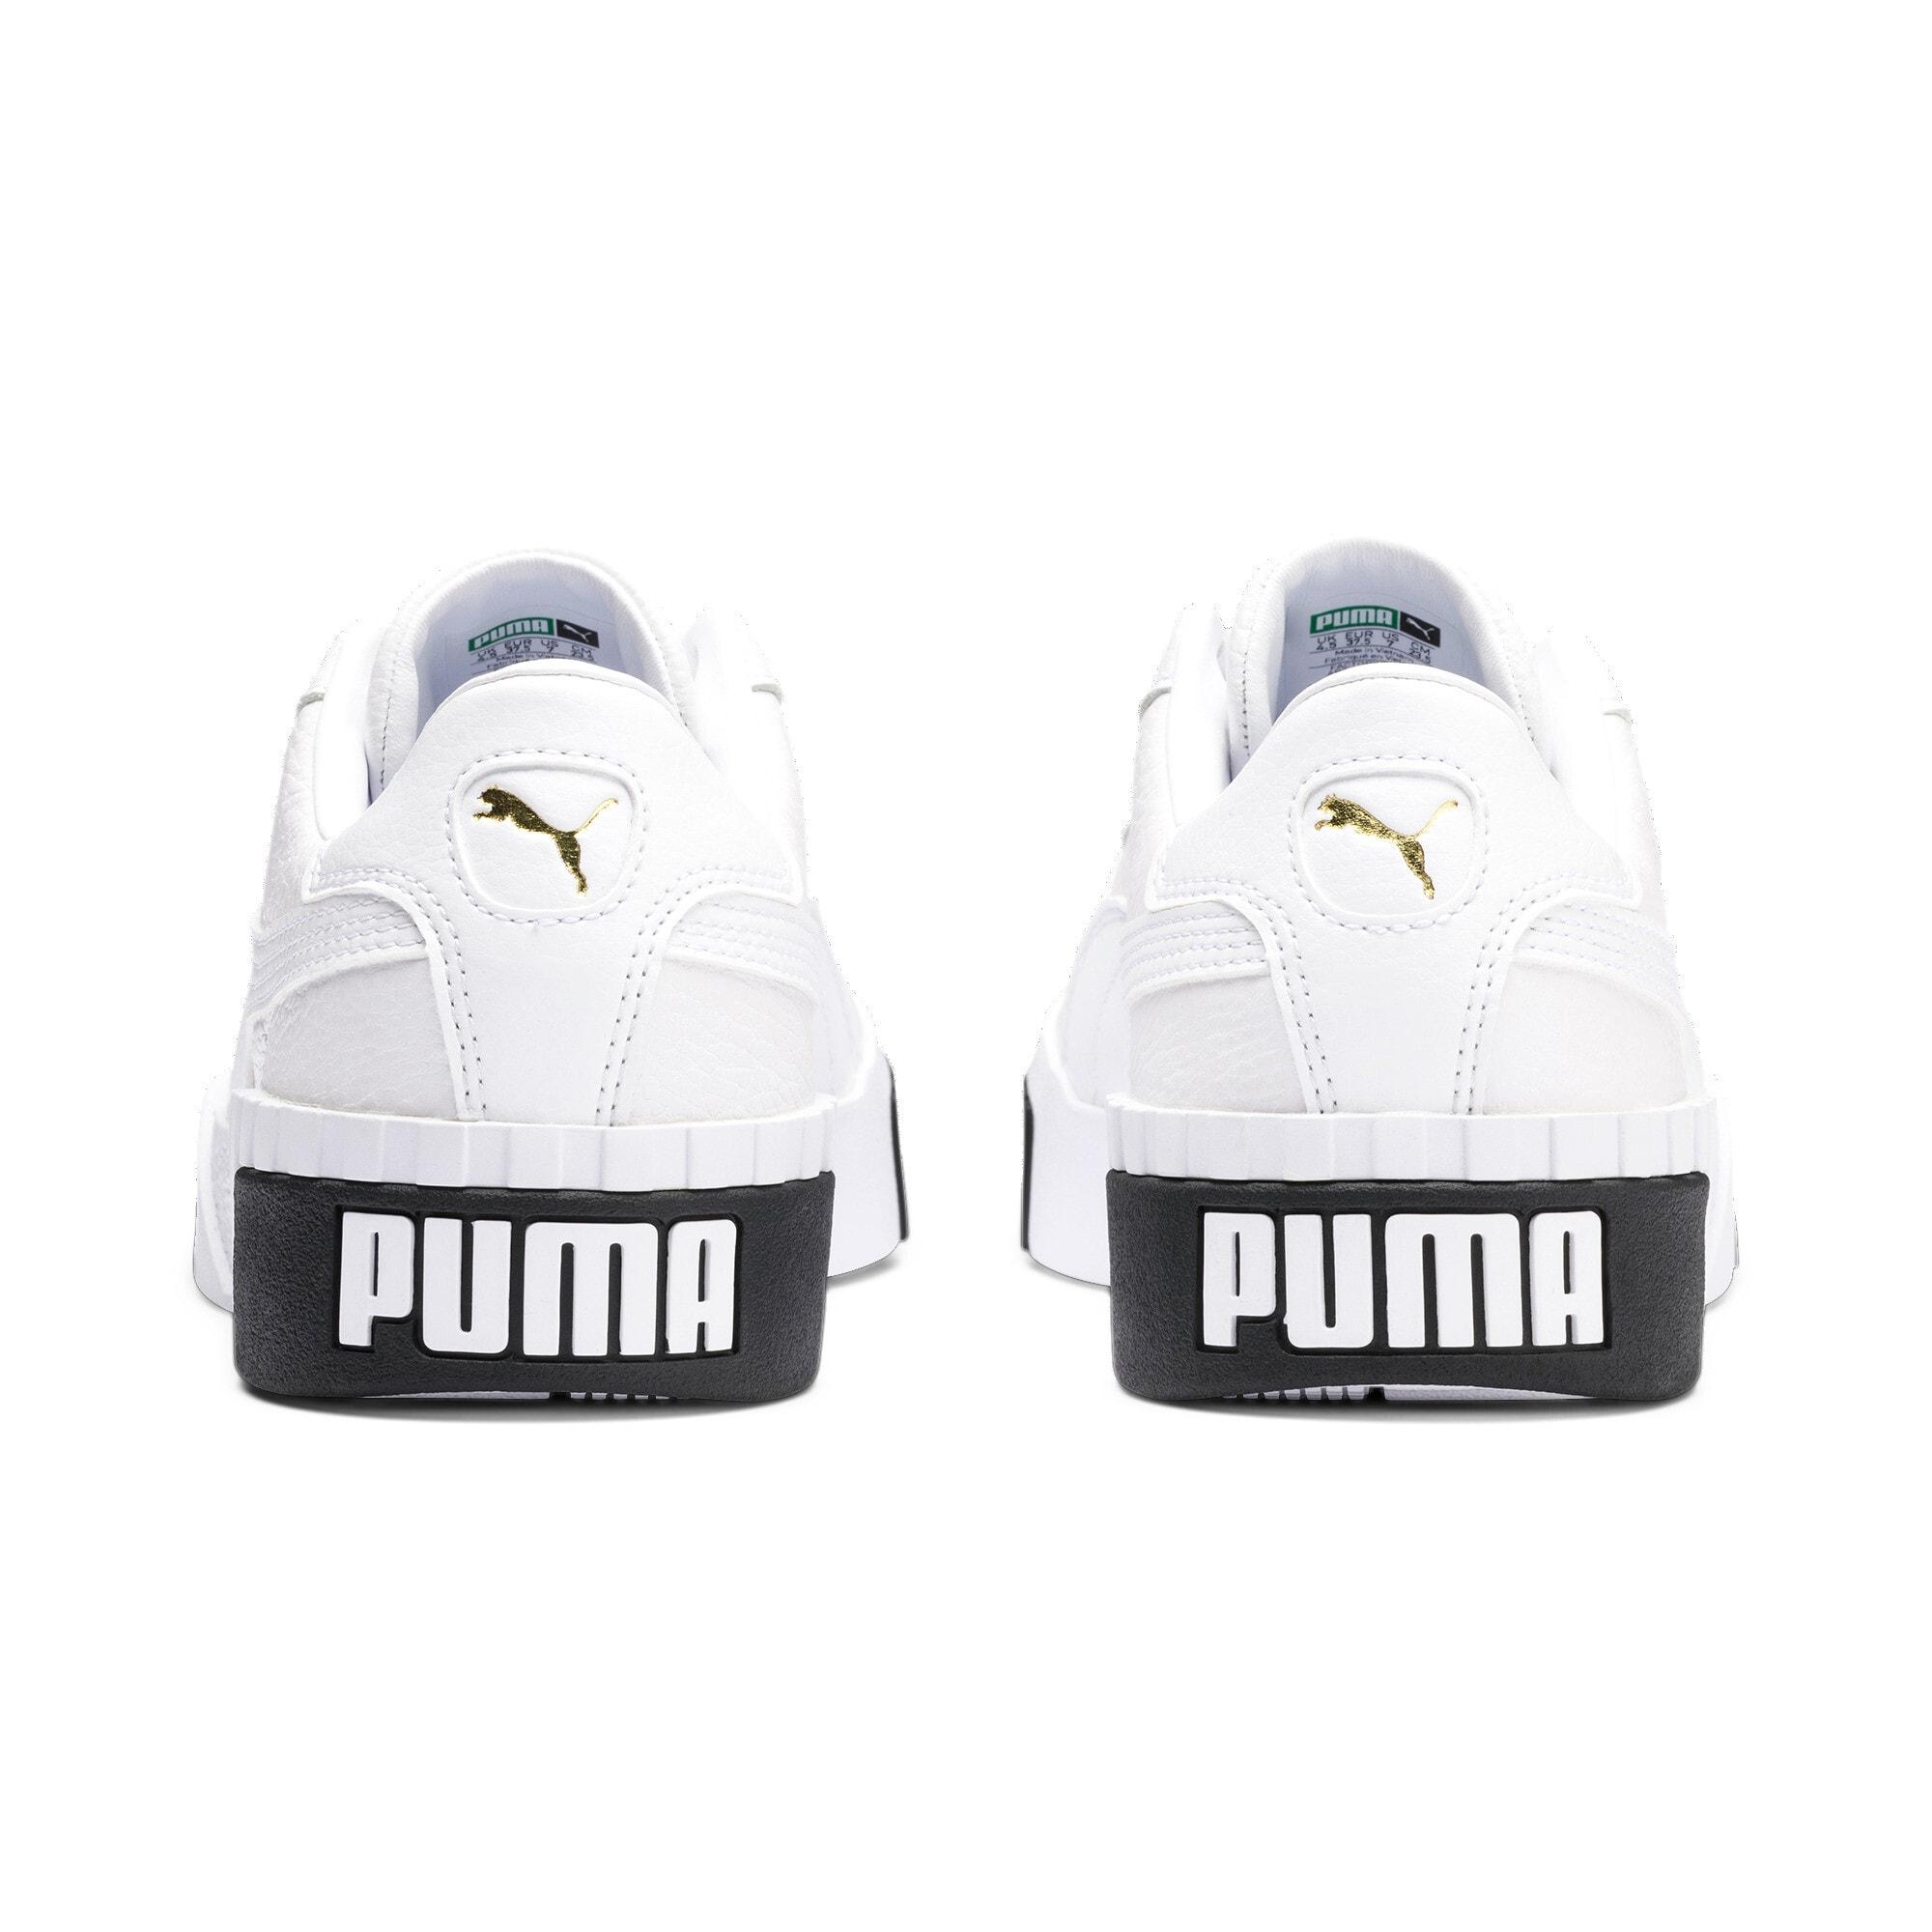 Thumbnail 4 of Cali Women's Trainers, Puma White-Puma Black, medium